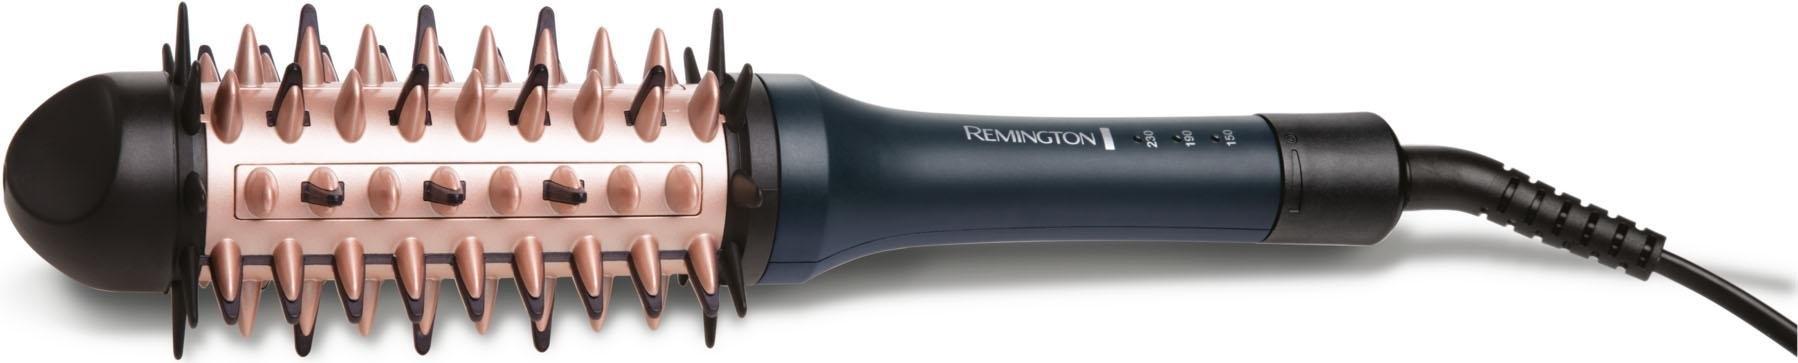 Remington elektrische stijlborstel CB7A138 - gratis ruilen op otto.nl